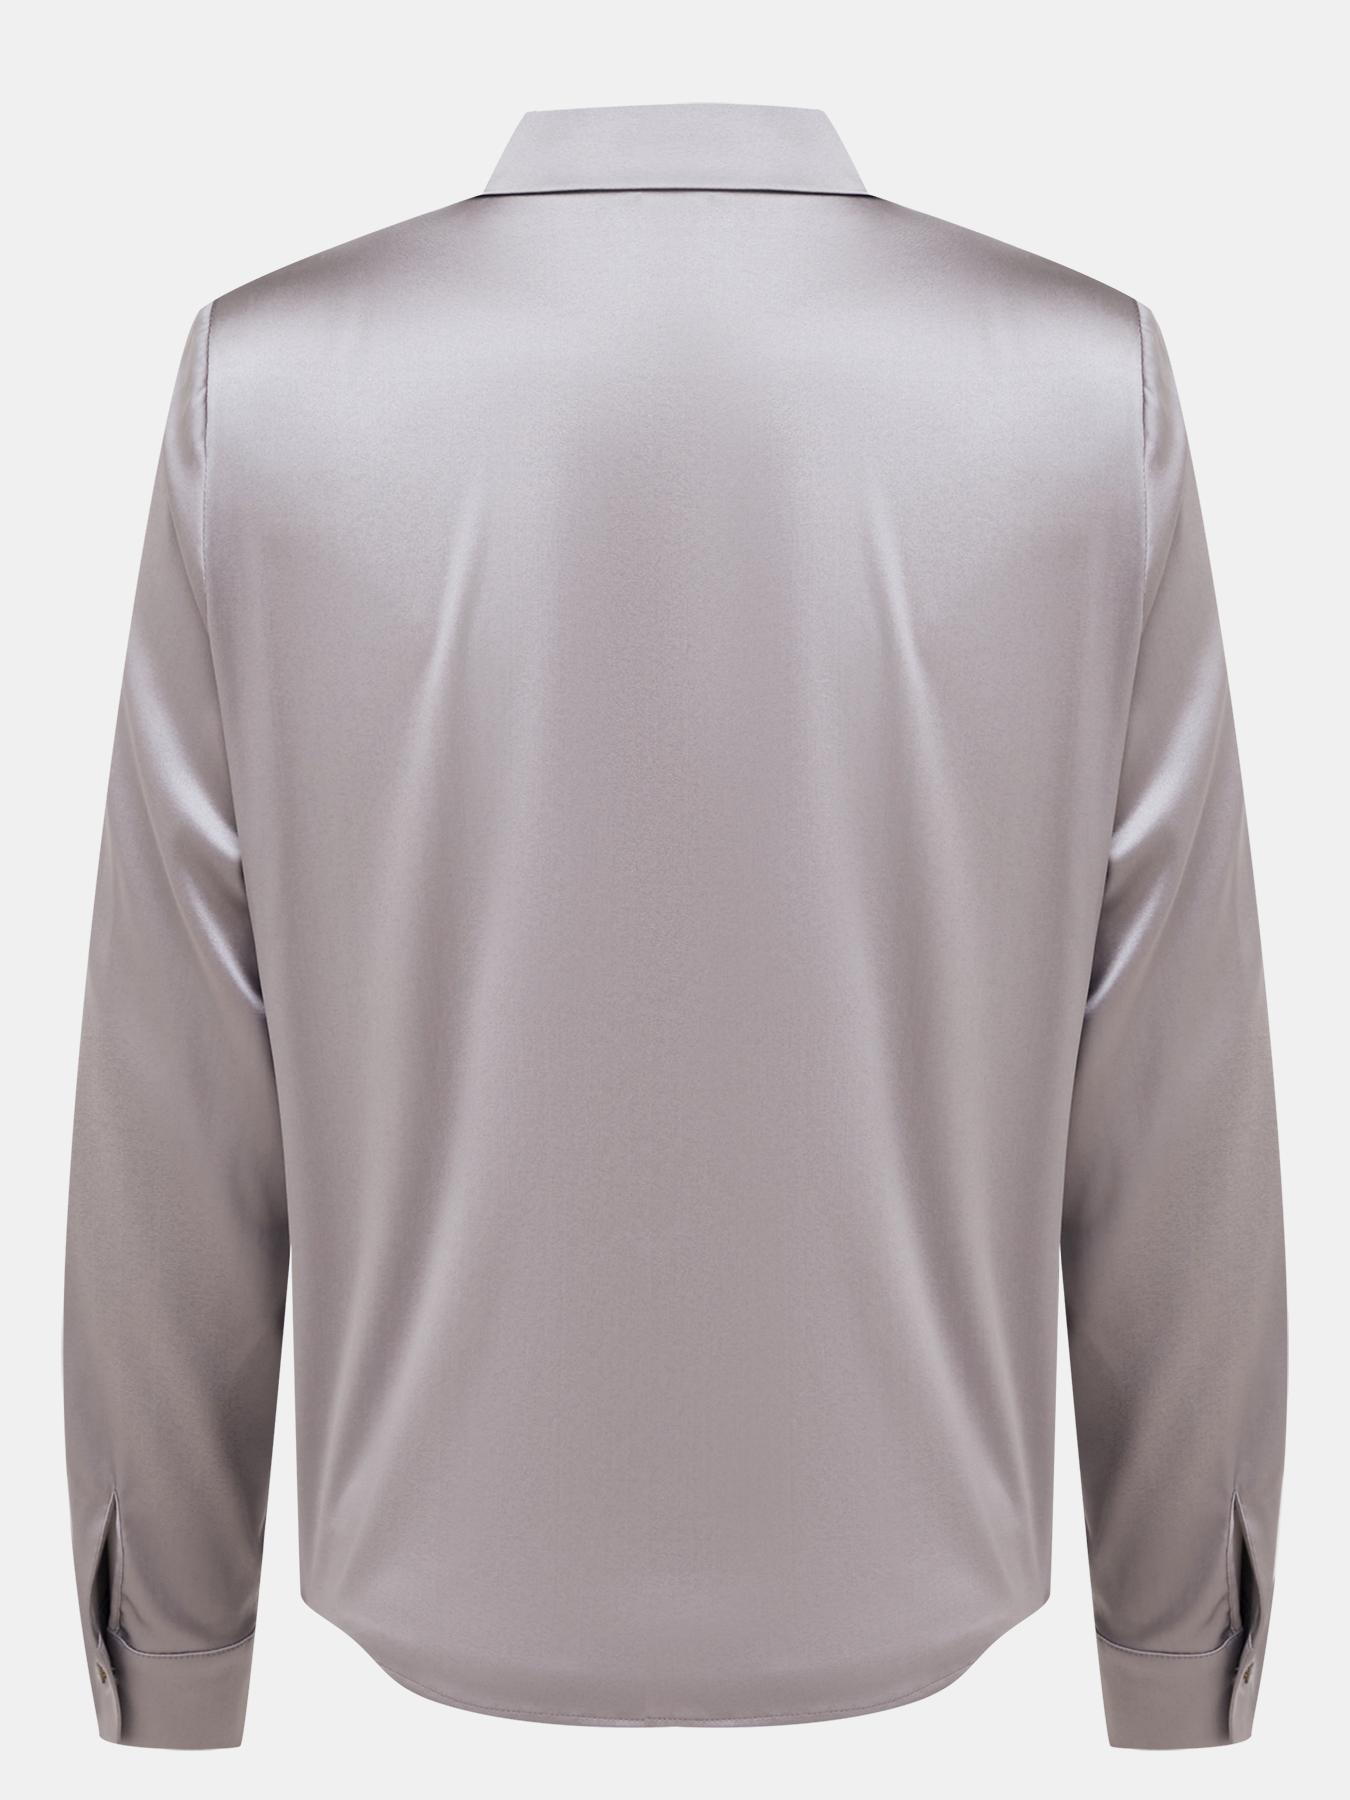 Блузка Pennyblack Рубашка цена 2017